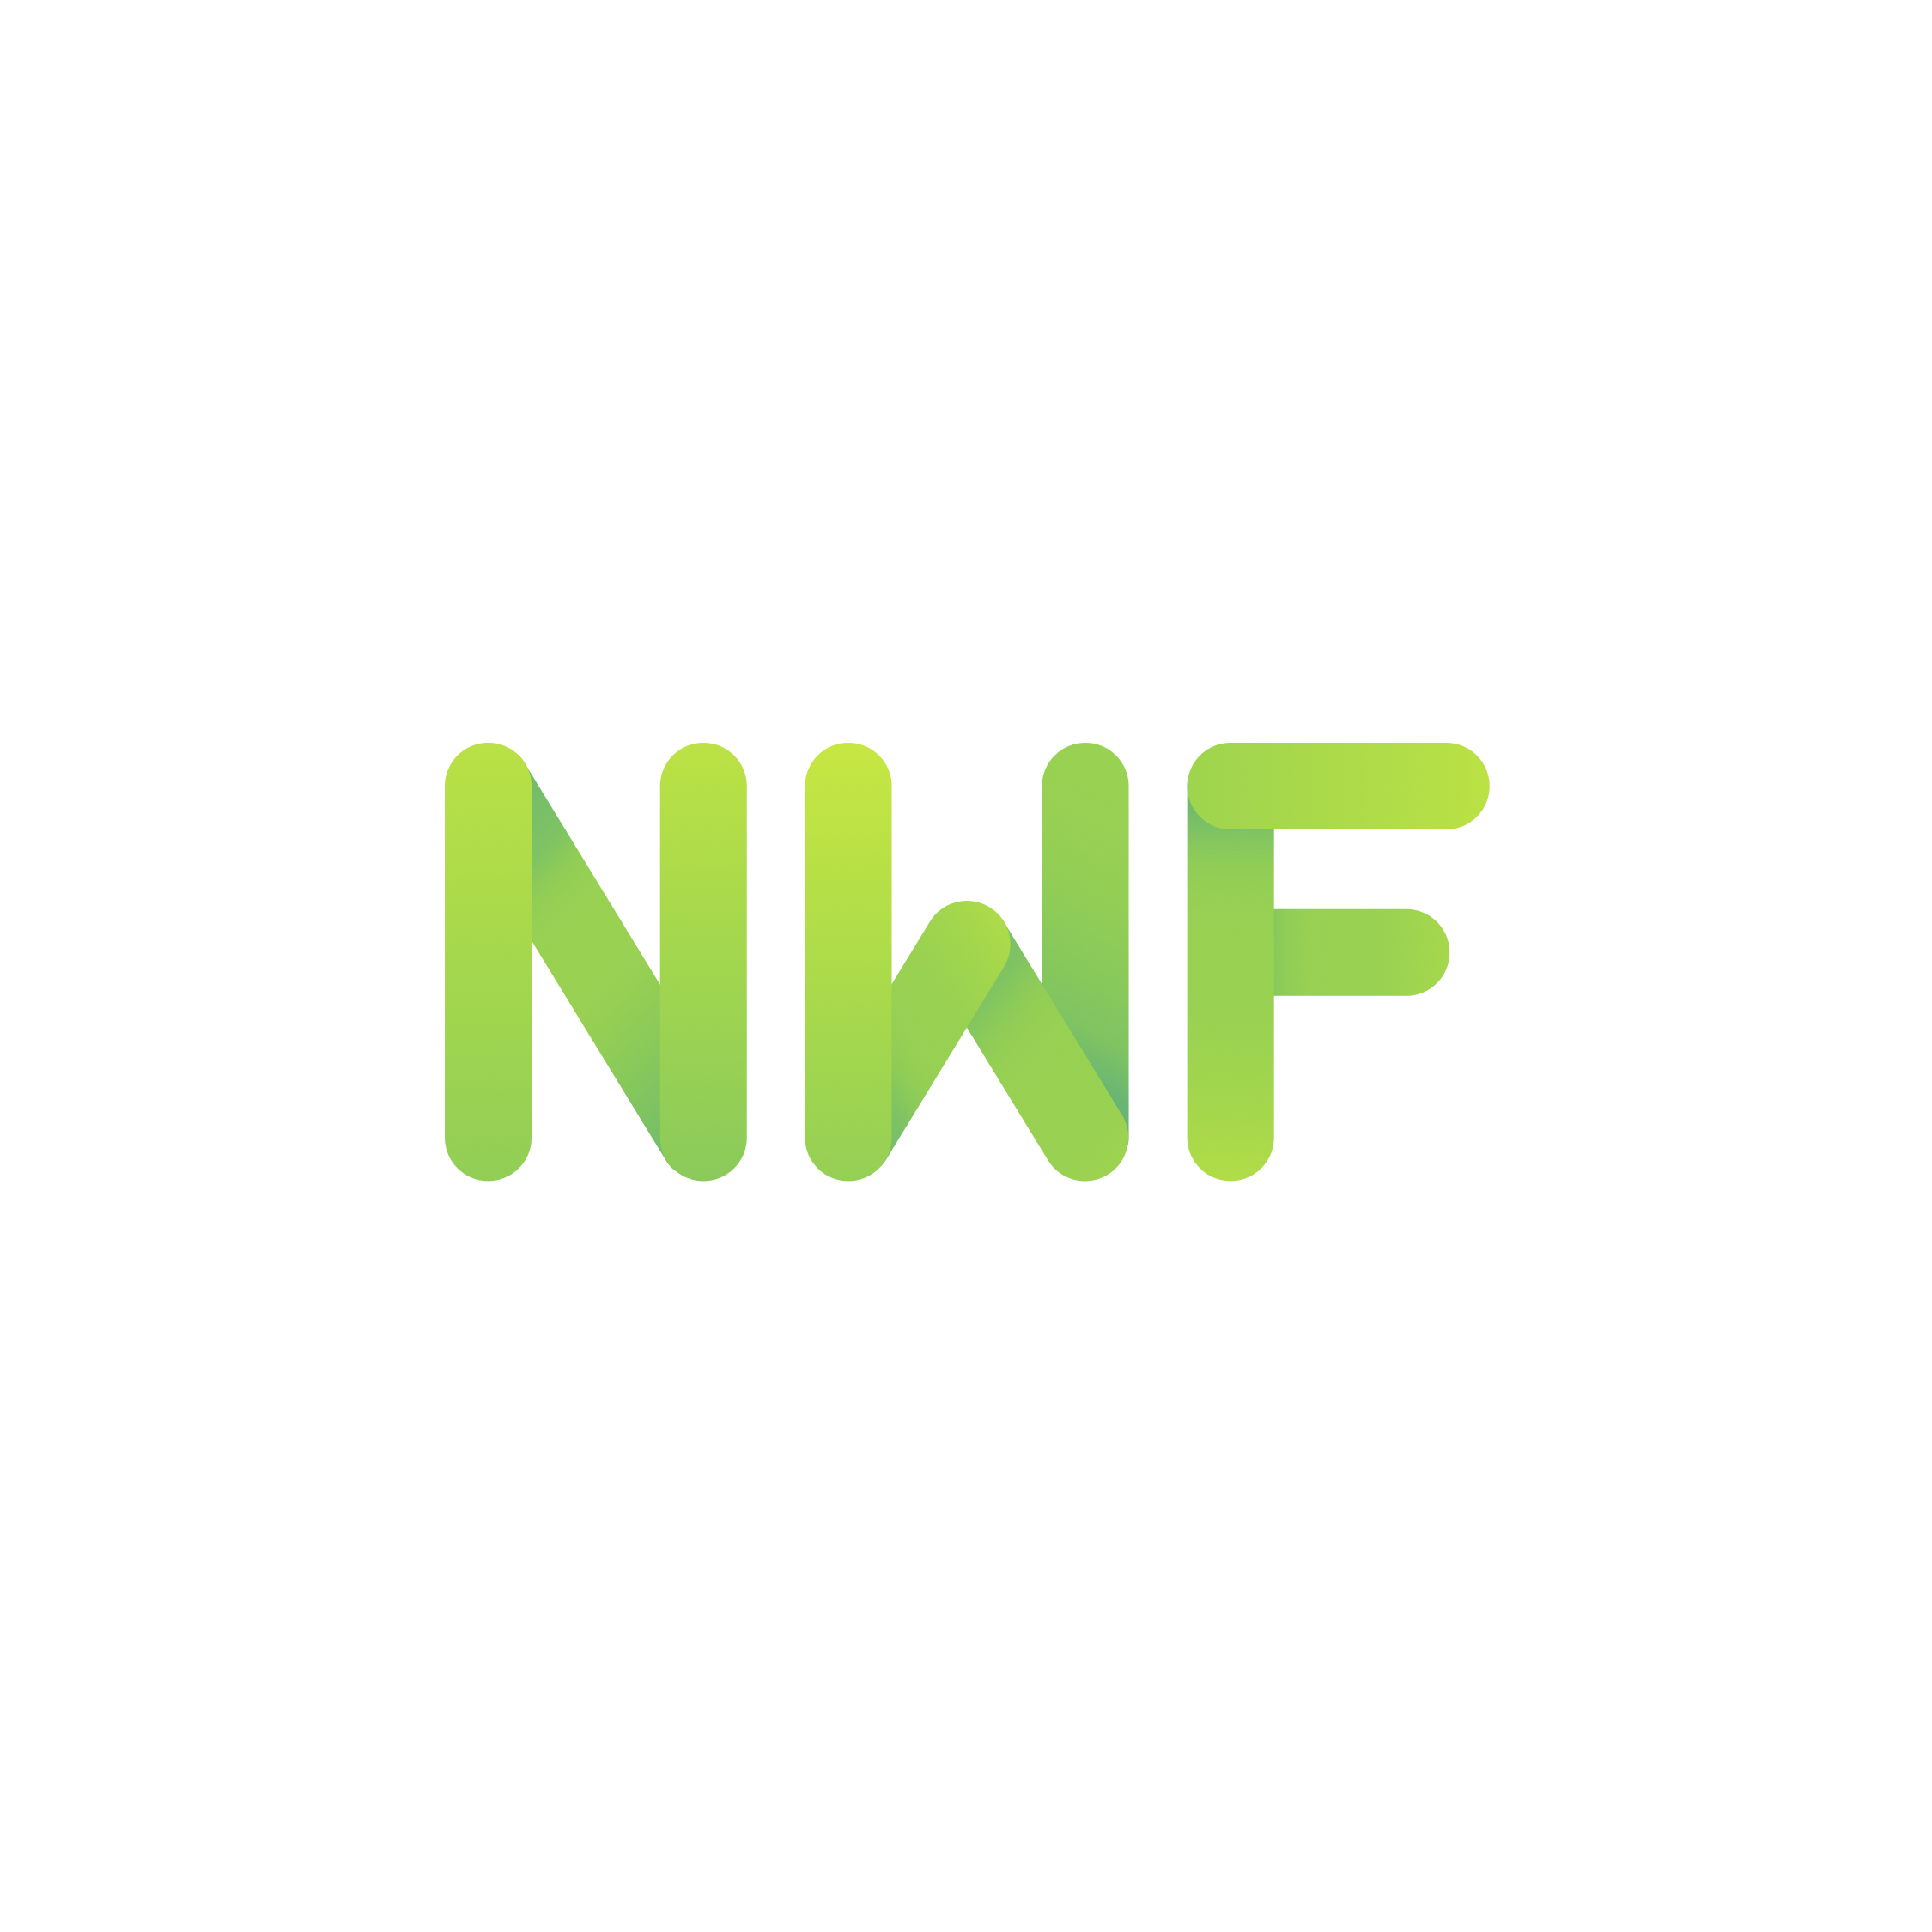 nwf.jpg